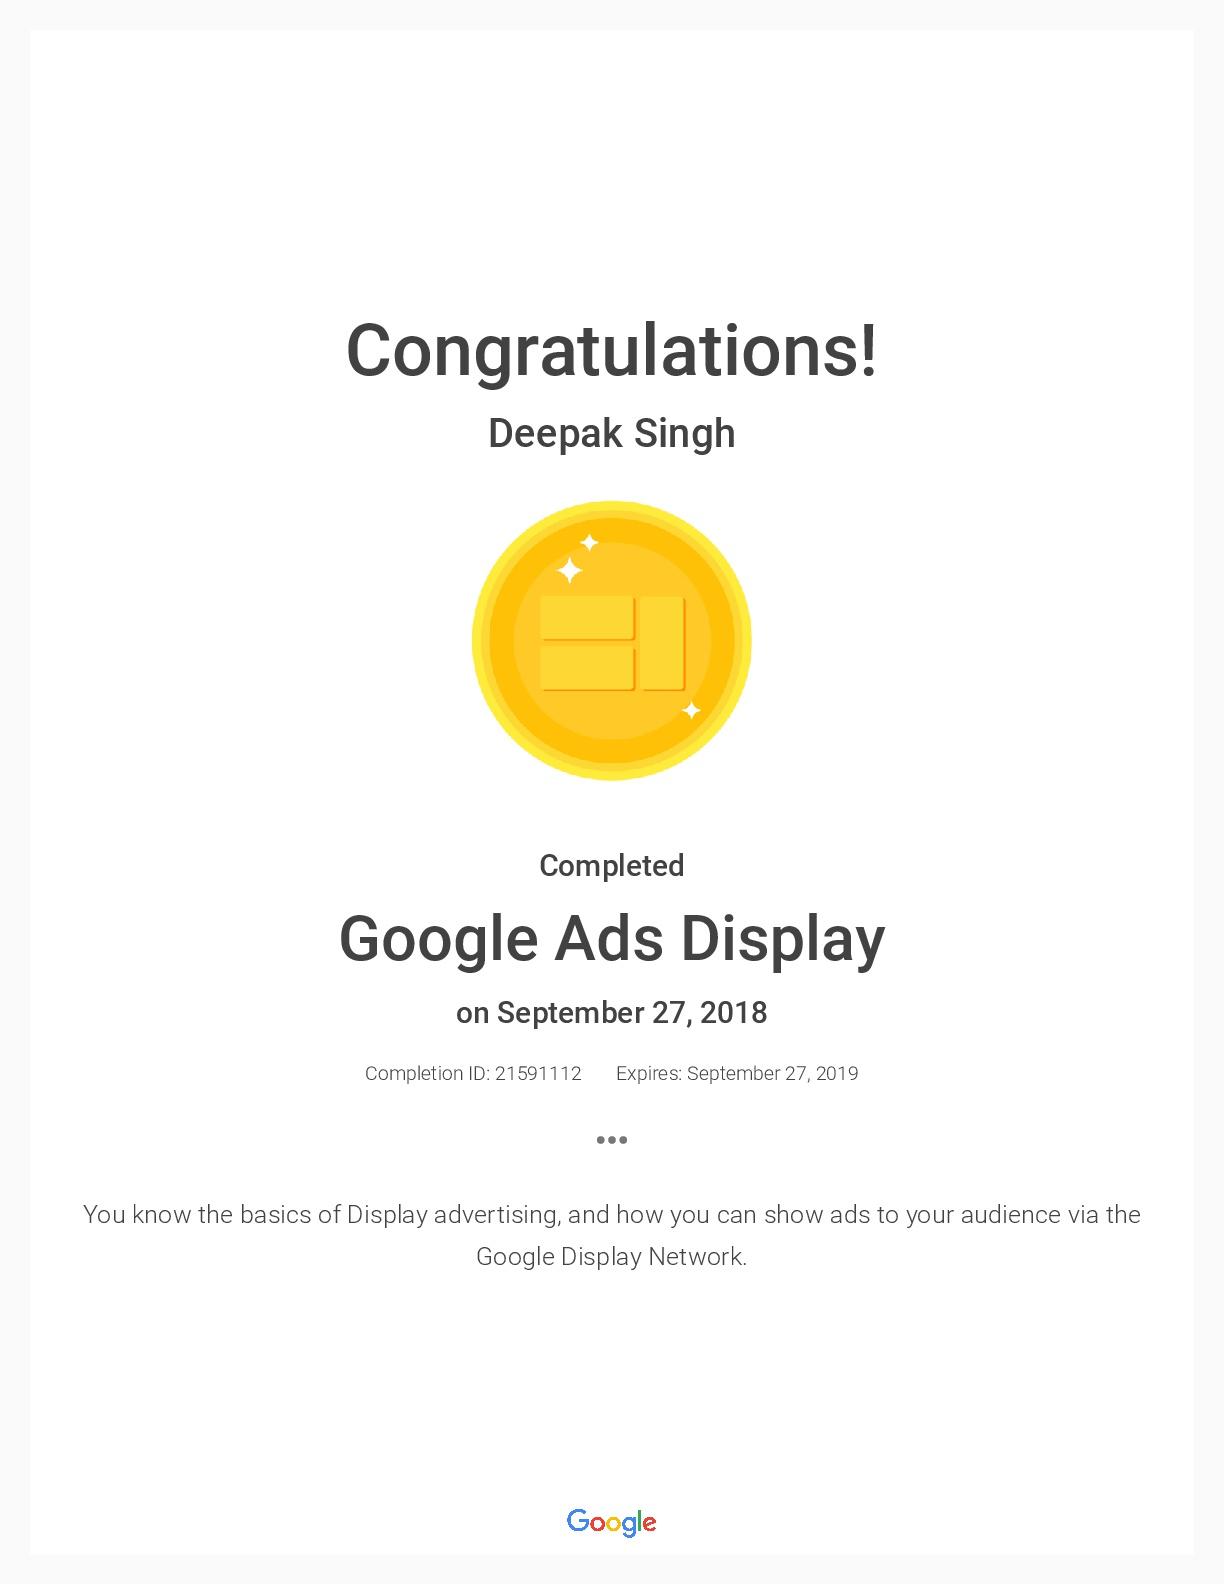 Deepak Singh Deepak Google Certificates